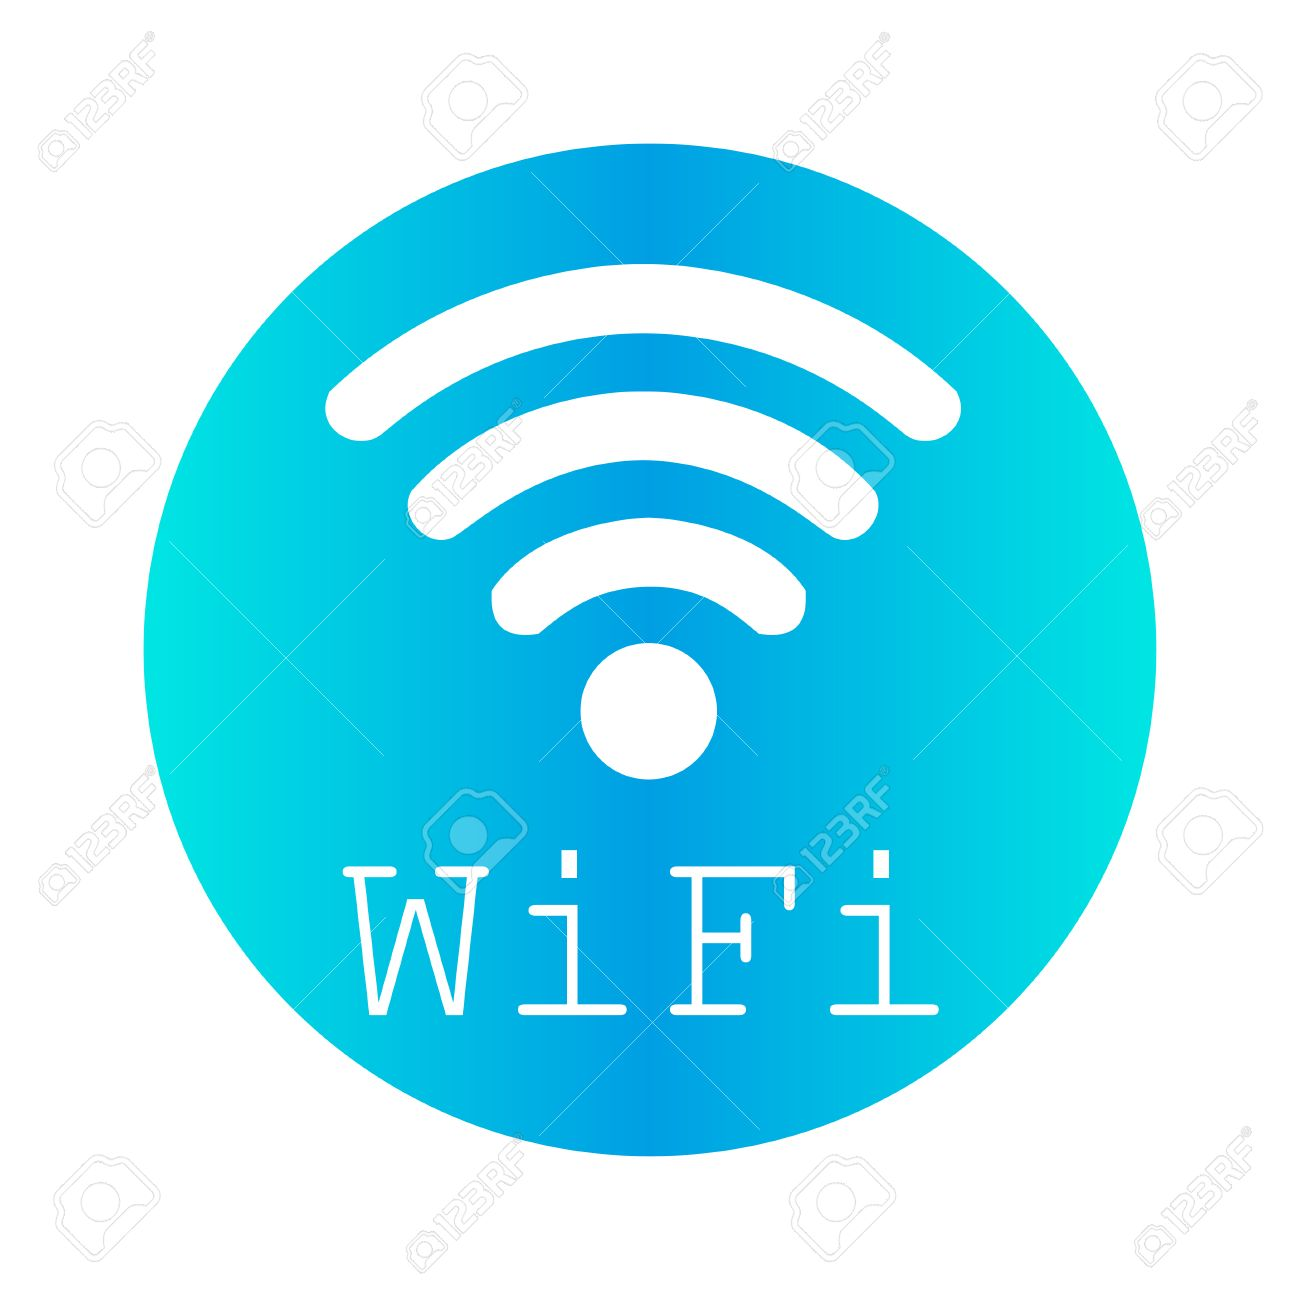 wifi logo baskan idai co rh baskan idai co wifi logo png wifi logon